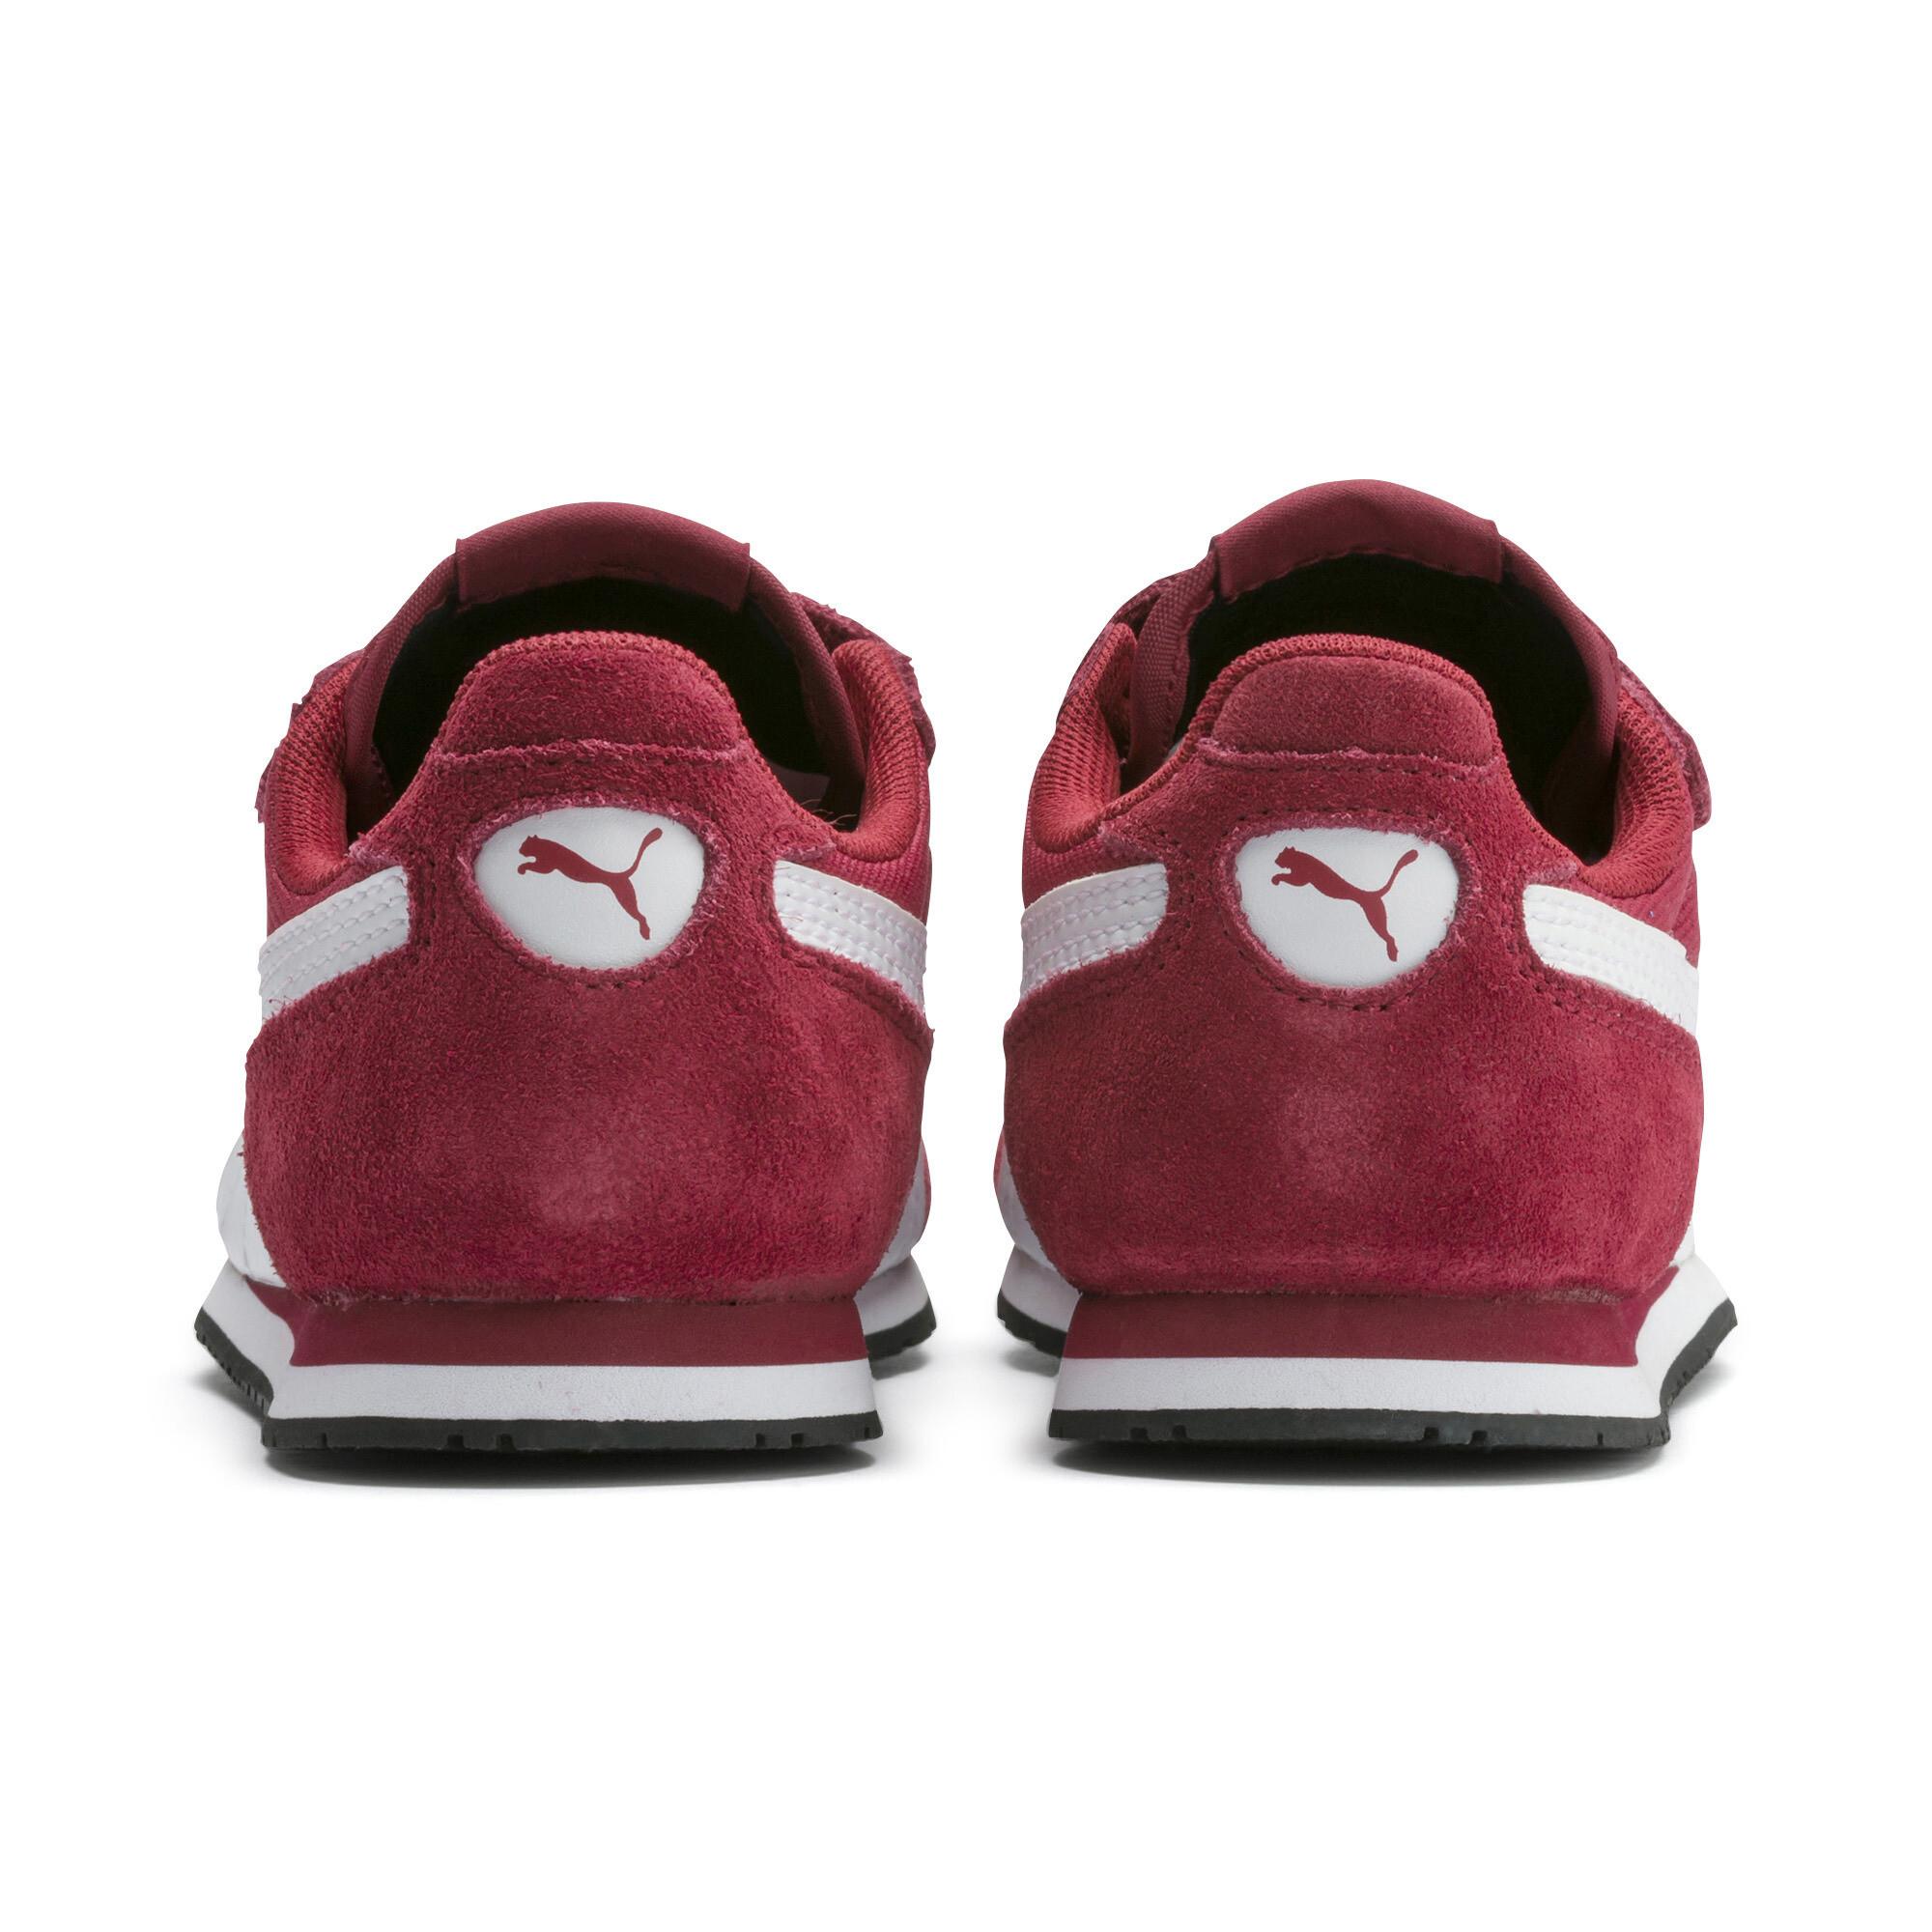 PUMA-Cabana-Racer-Little-Kids-039-Shoes-Kids-Shoe-Kids thumbnail 3